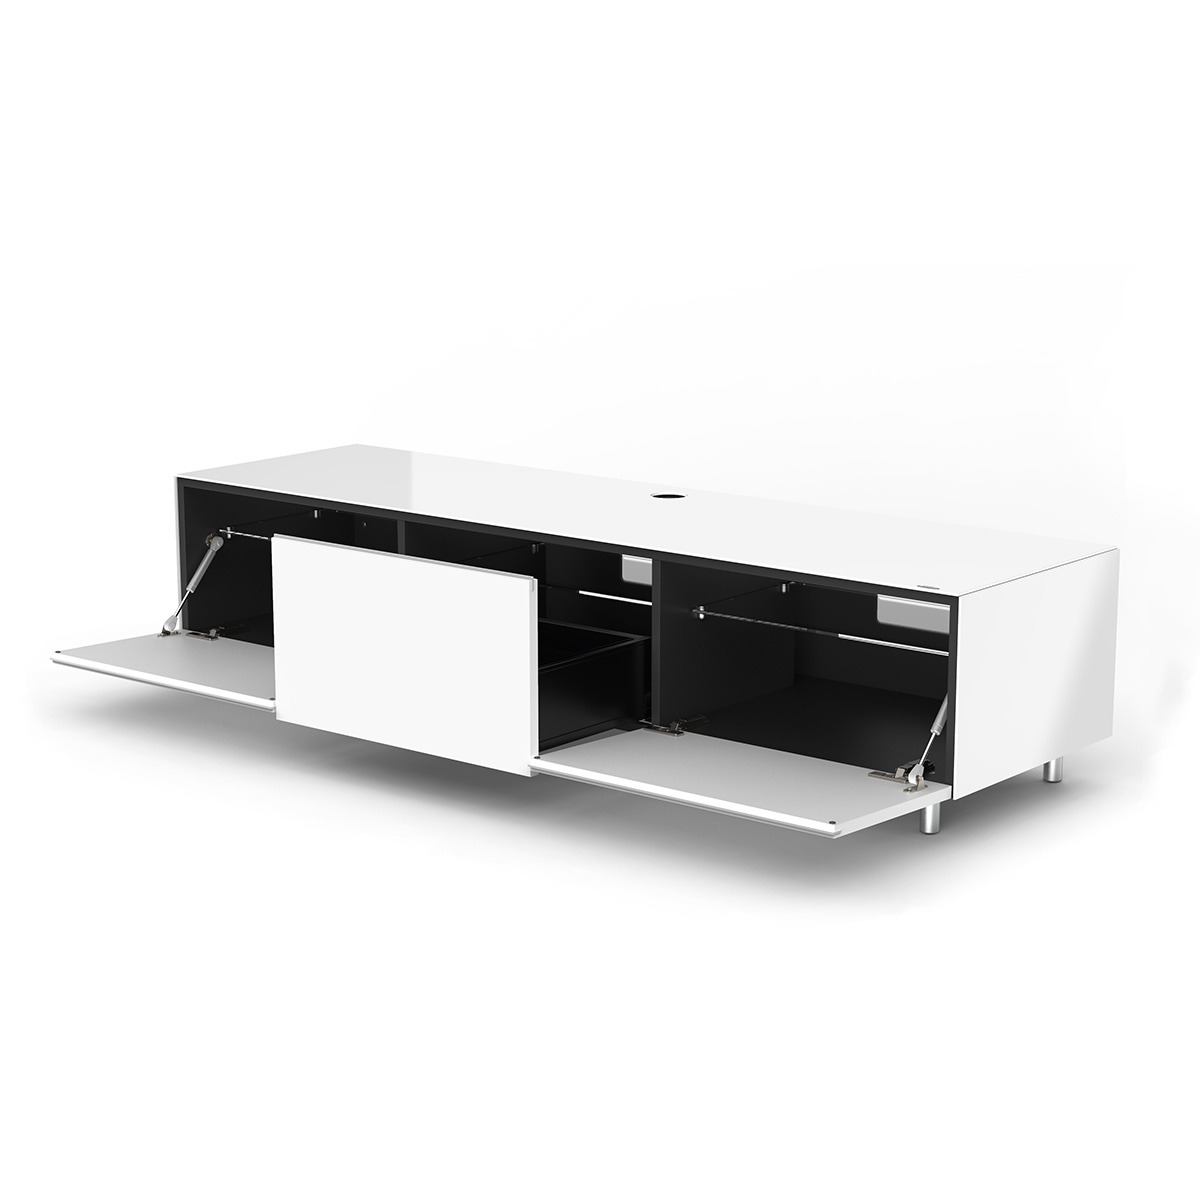 Afbeelding van Just Racks JRL1650T-SL BG TV meubel